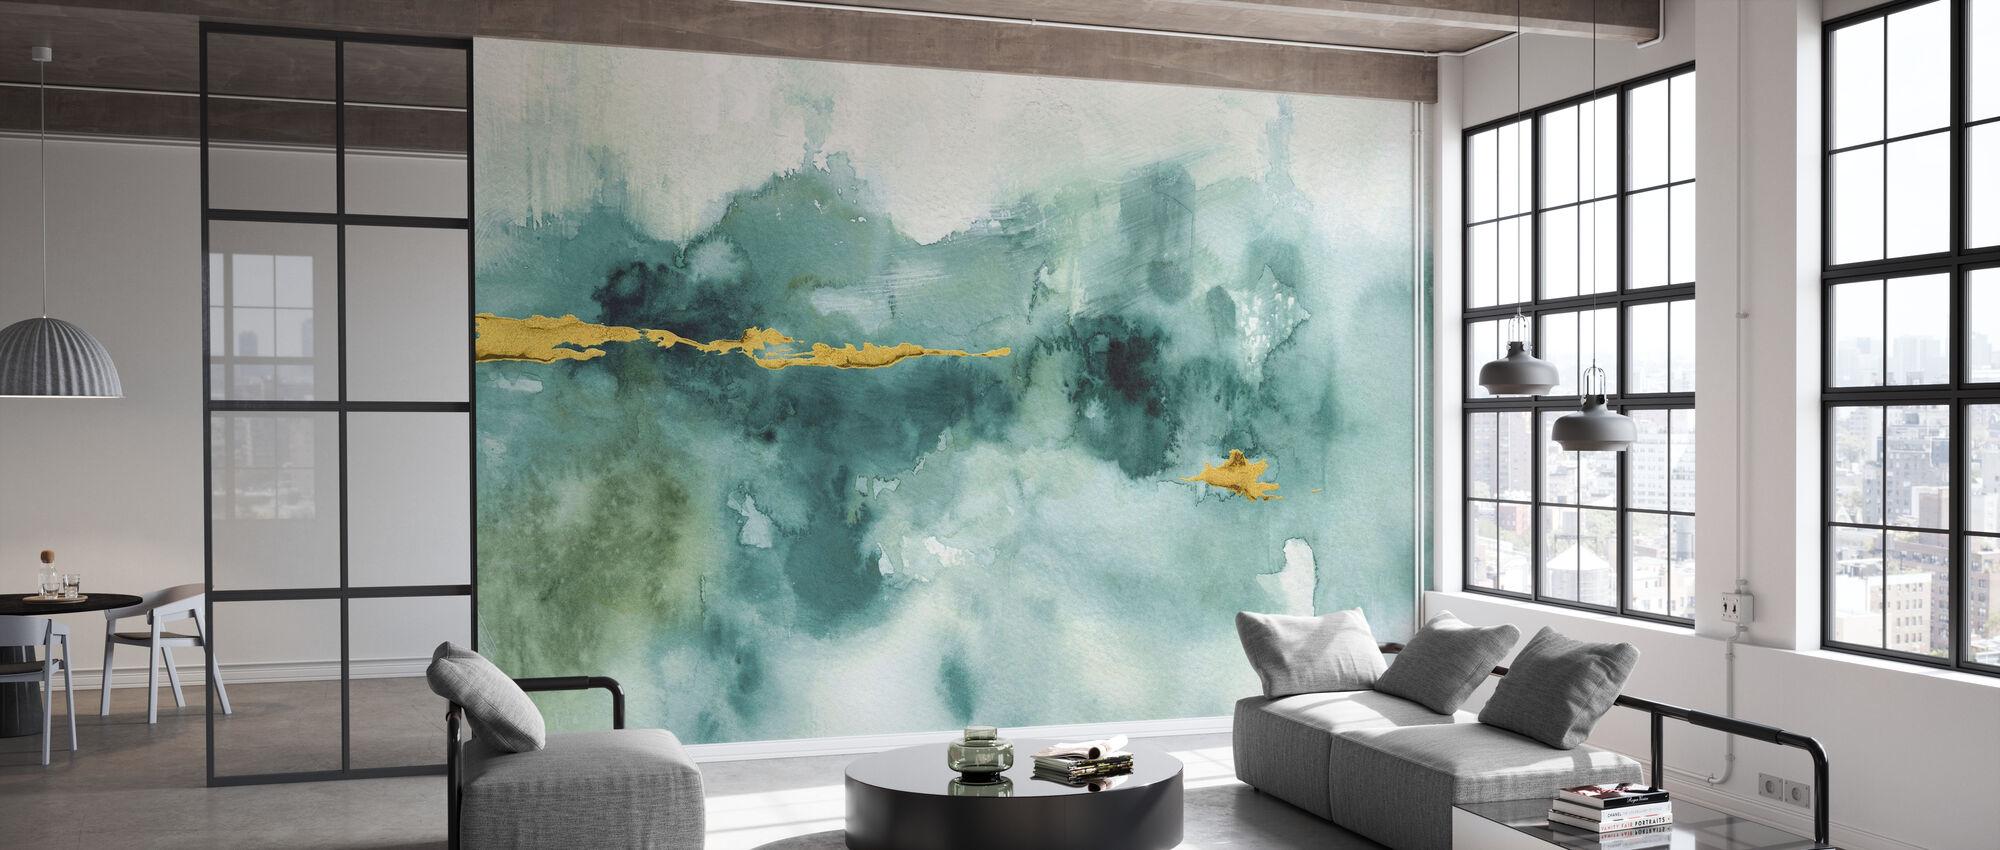 Min drivhus akvarell 3 - Tapet - Kontor